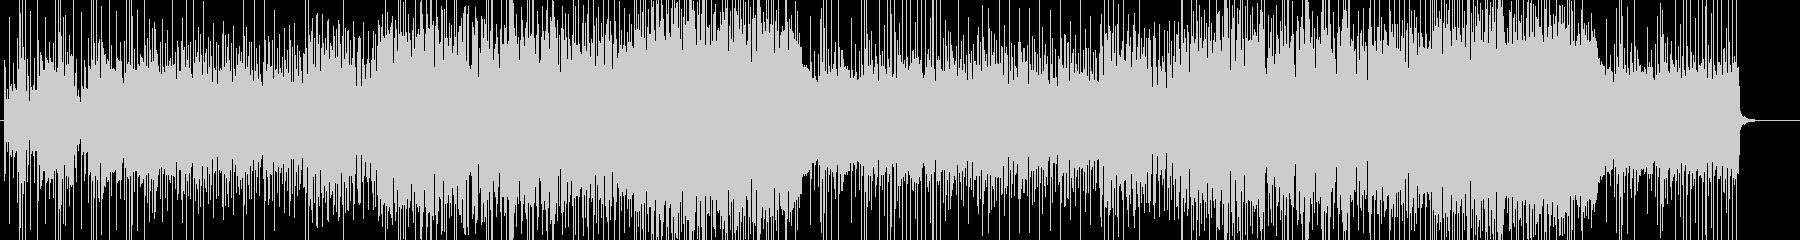 「HR/HM」「DARK」BGM154の未再生の波形